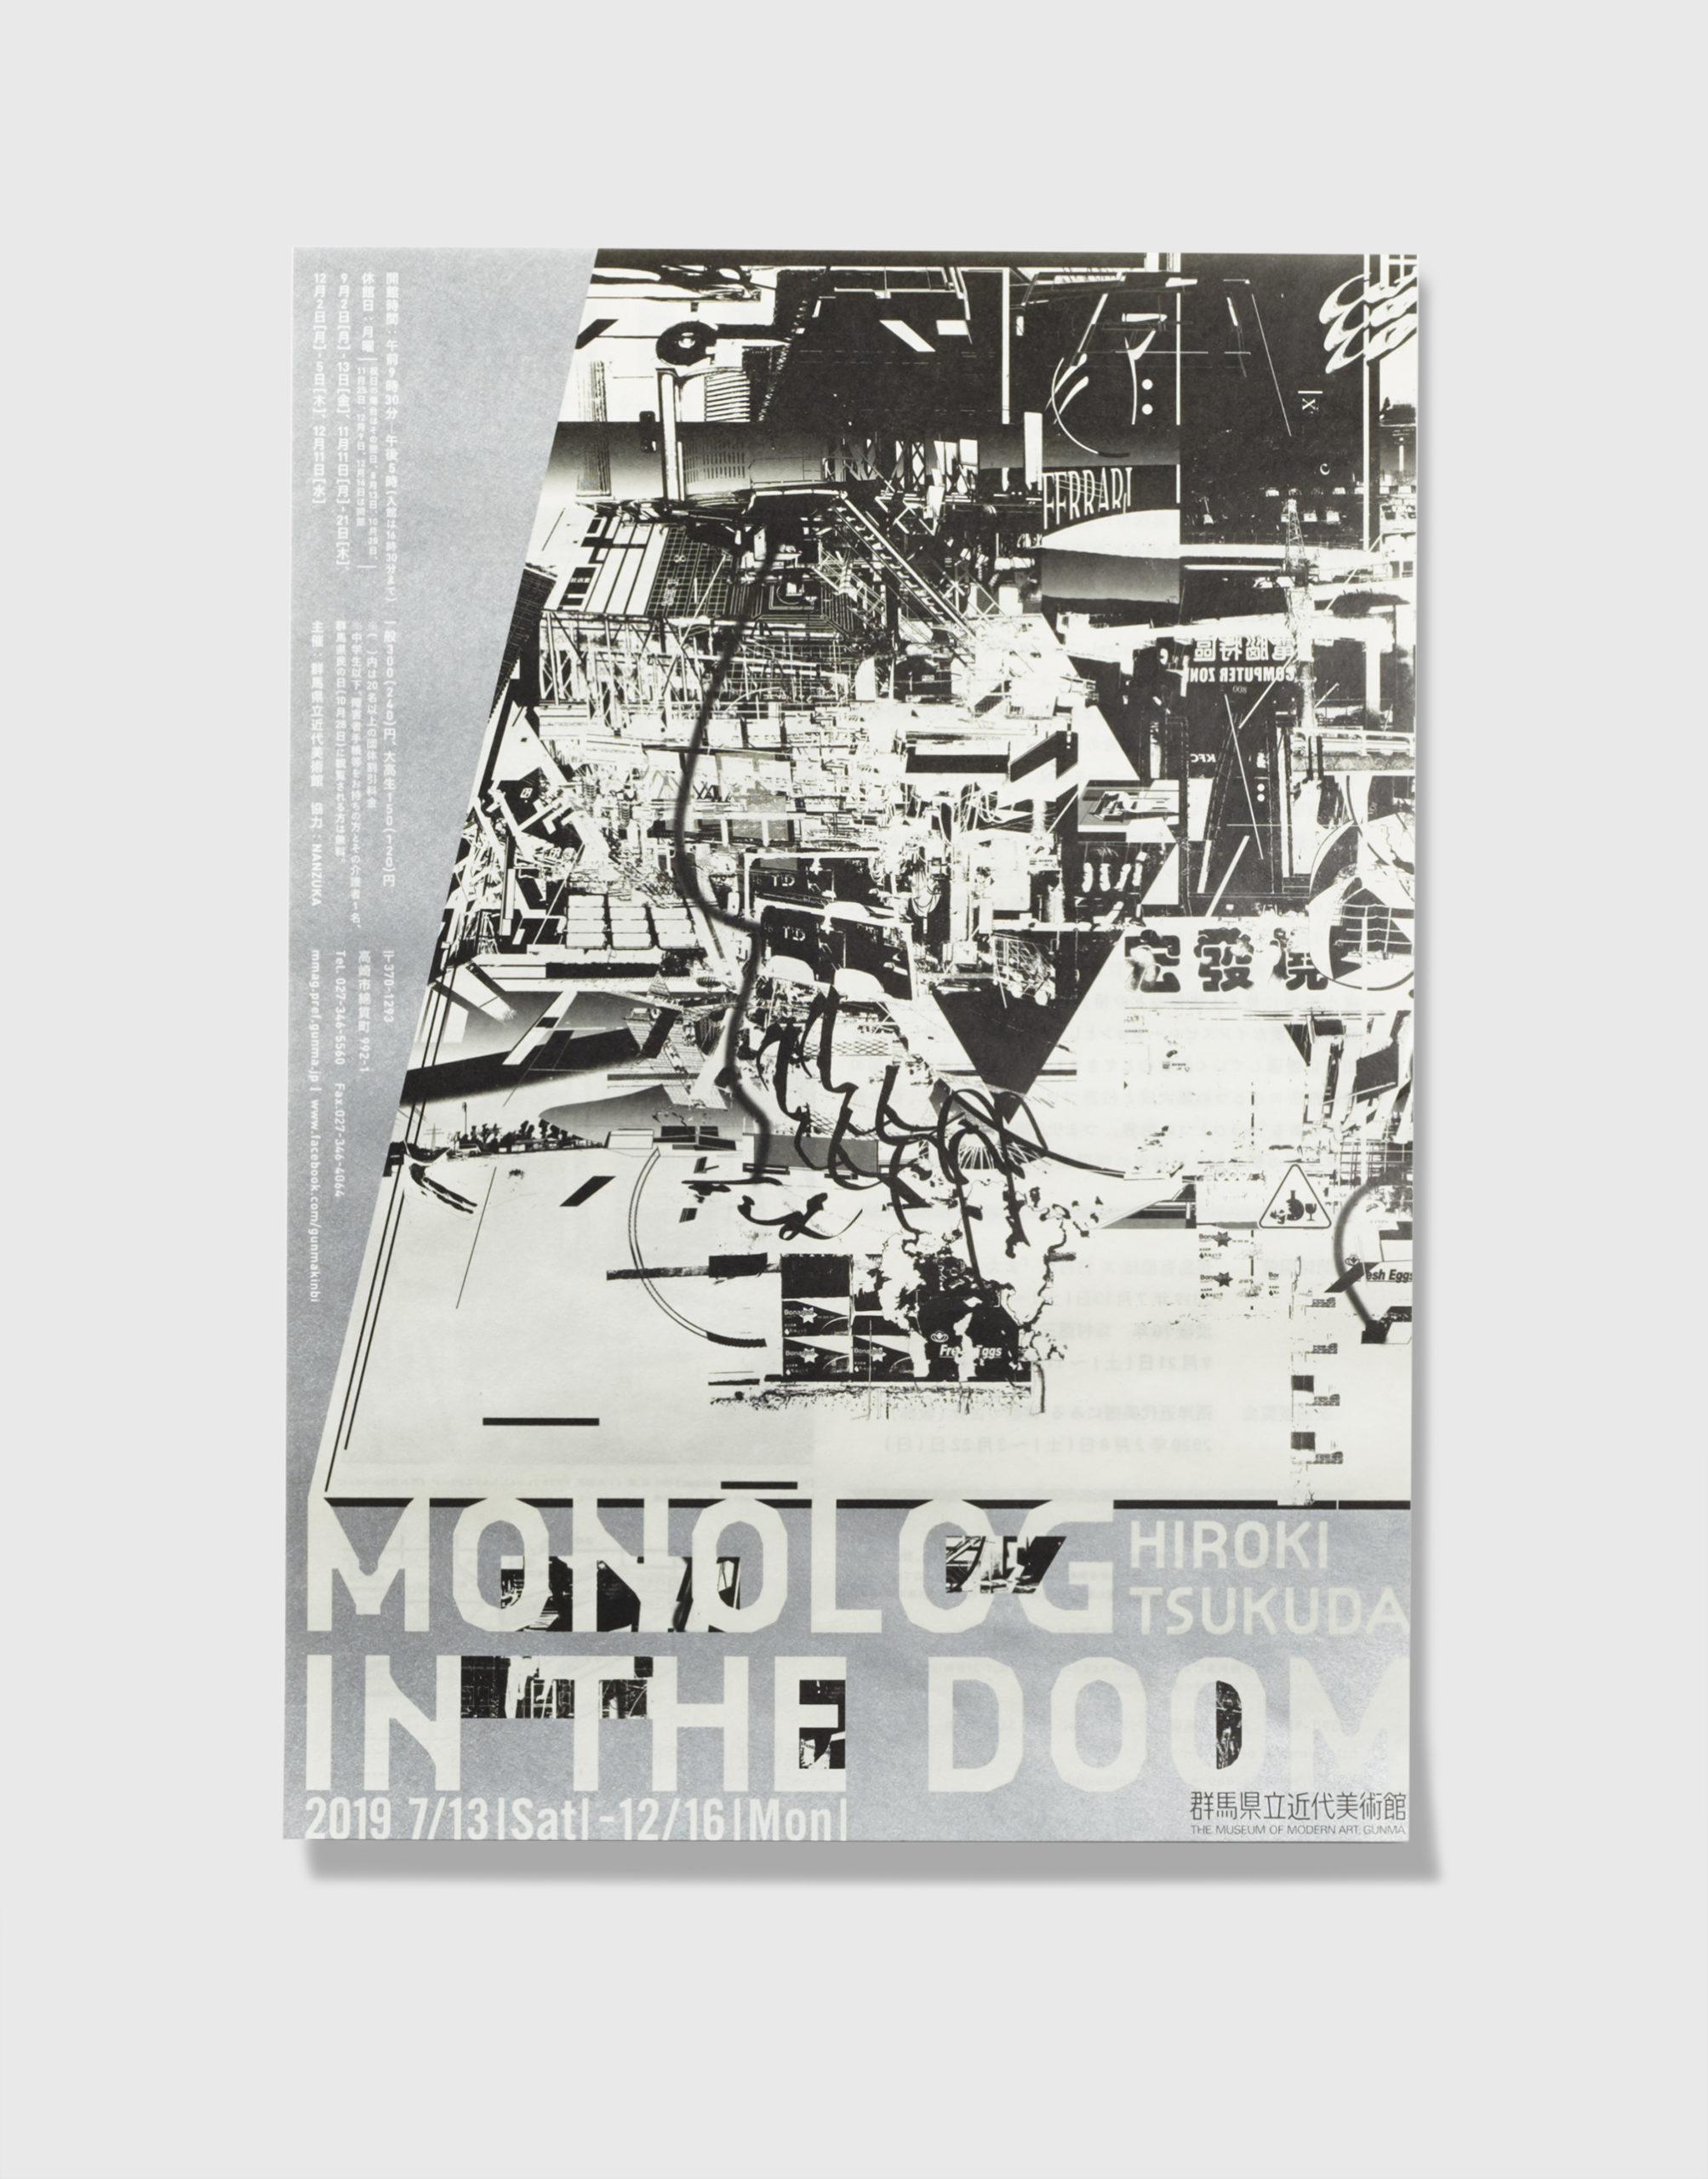 MONOLOG IN THE DOOM  HIROKI TSUKUDA Exhibition